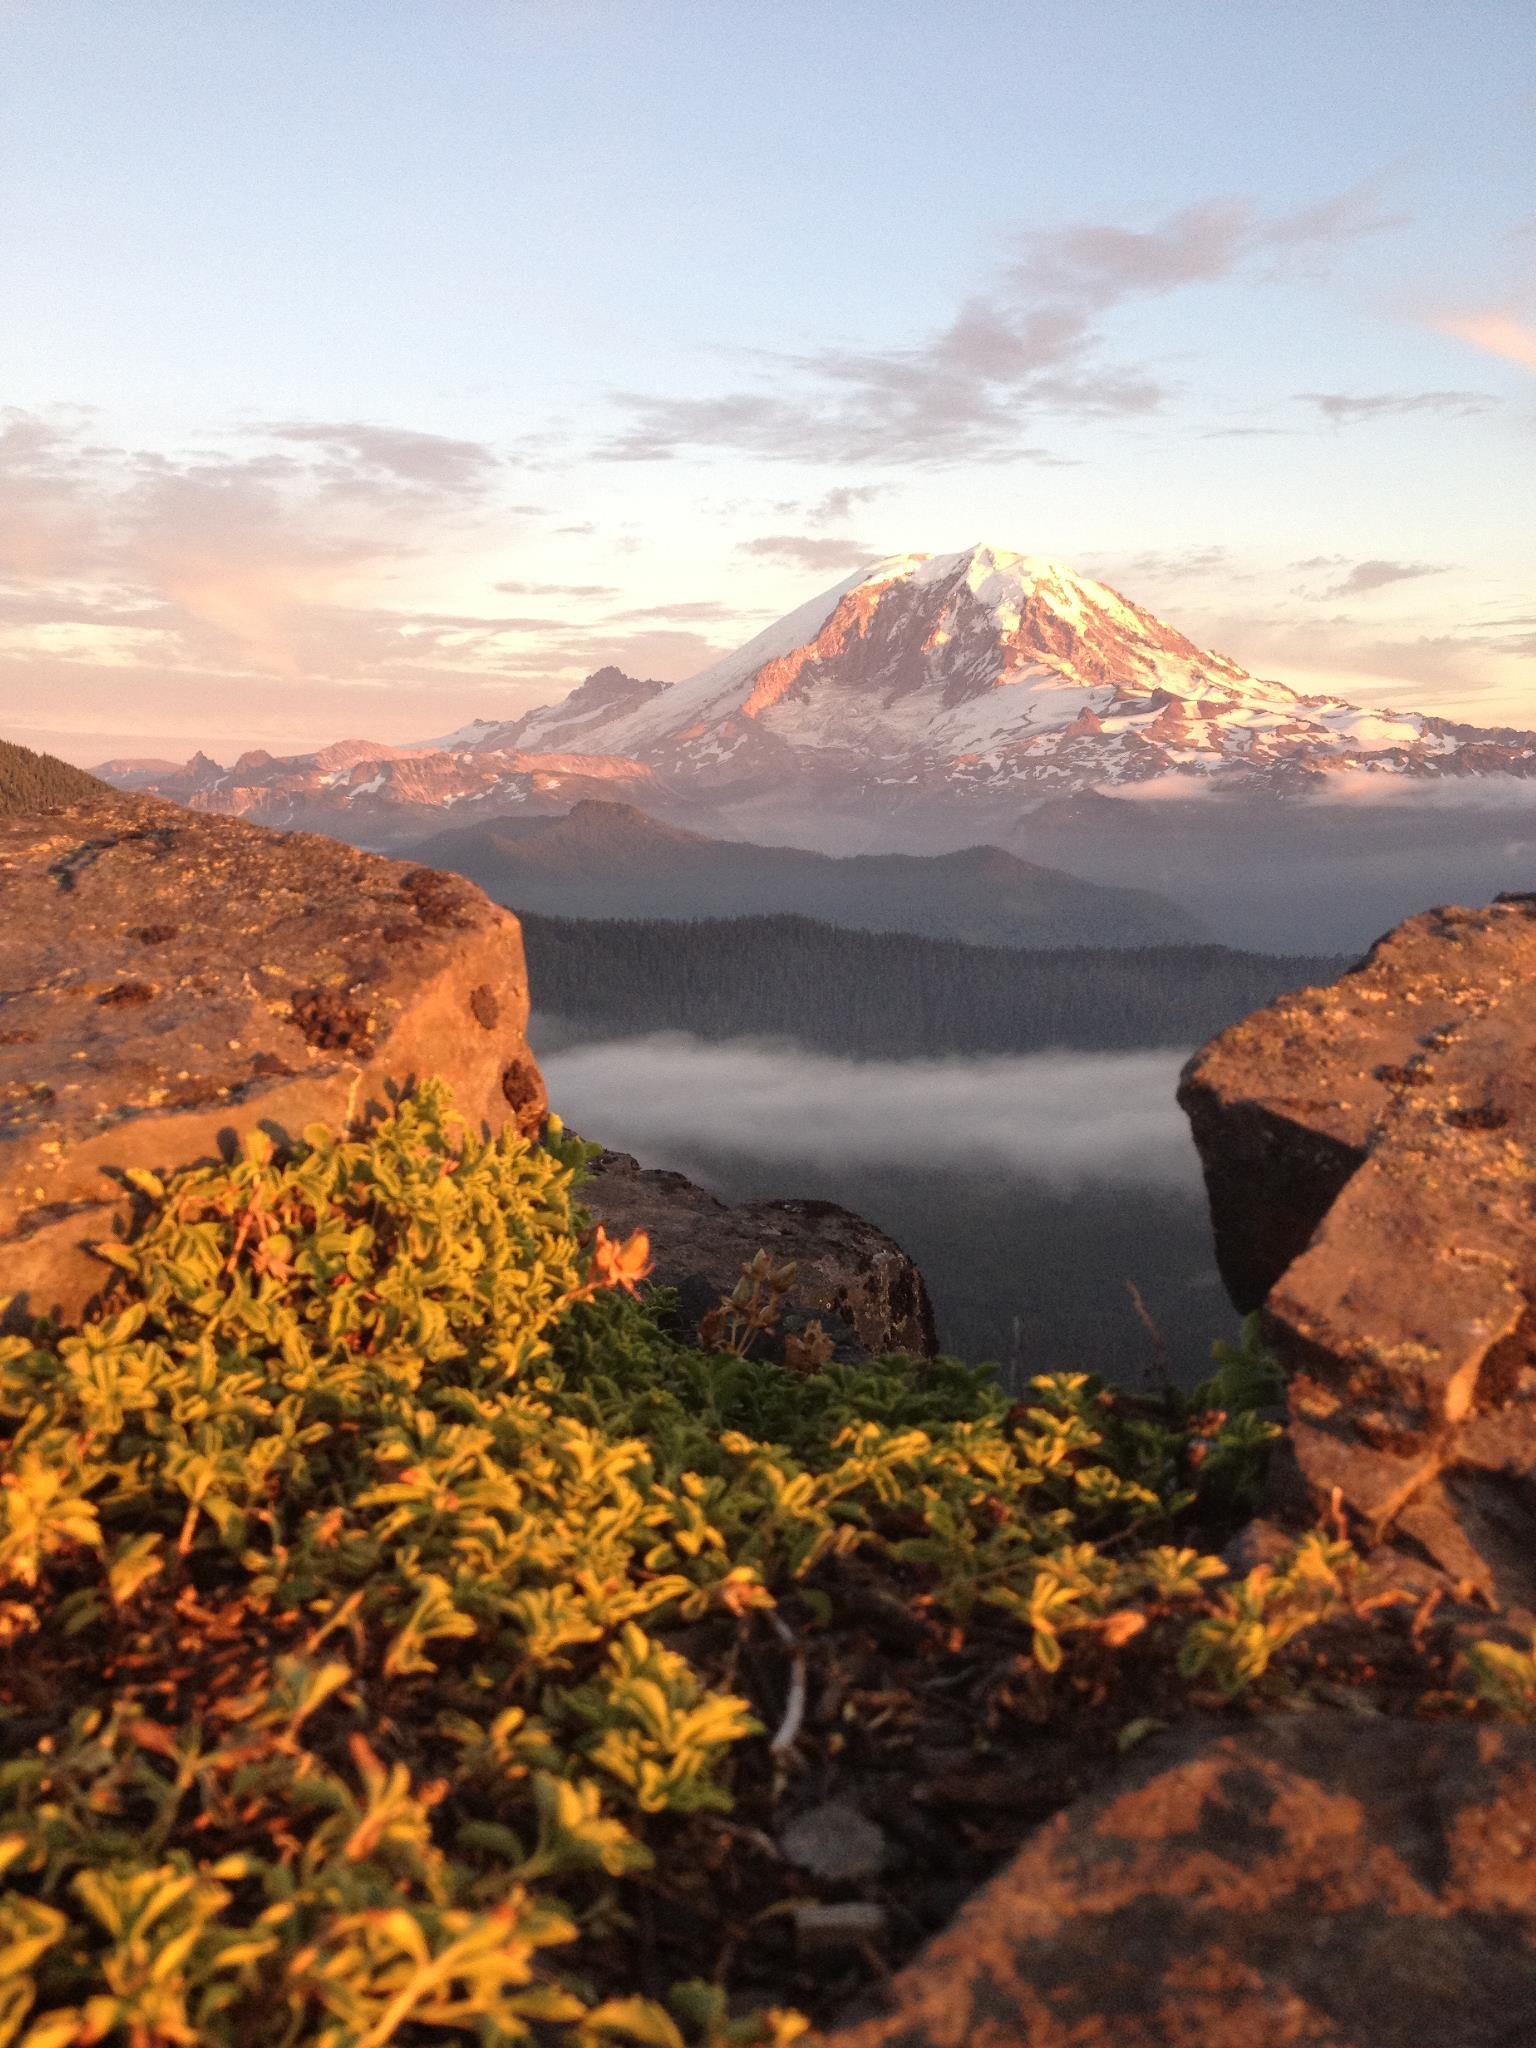 Jesse's Mt. Rainier